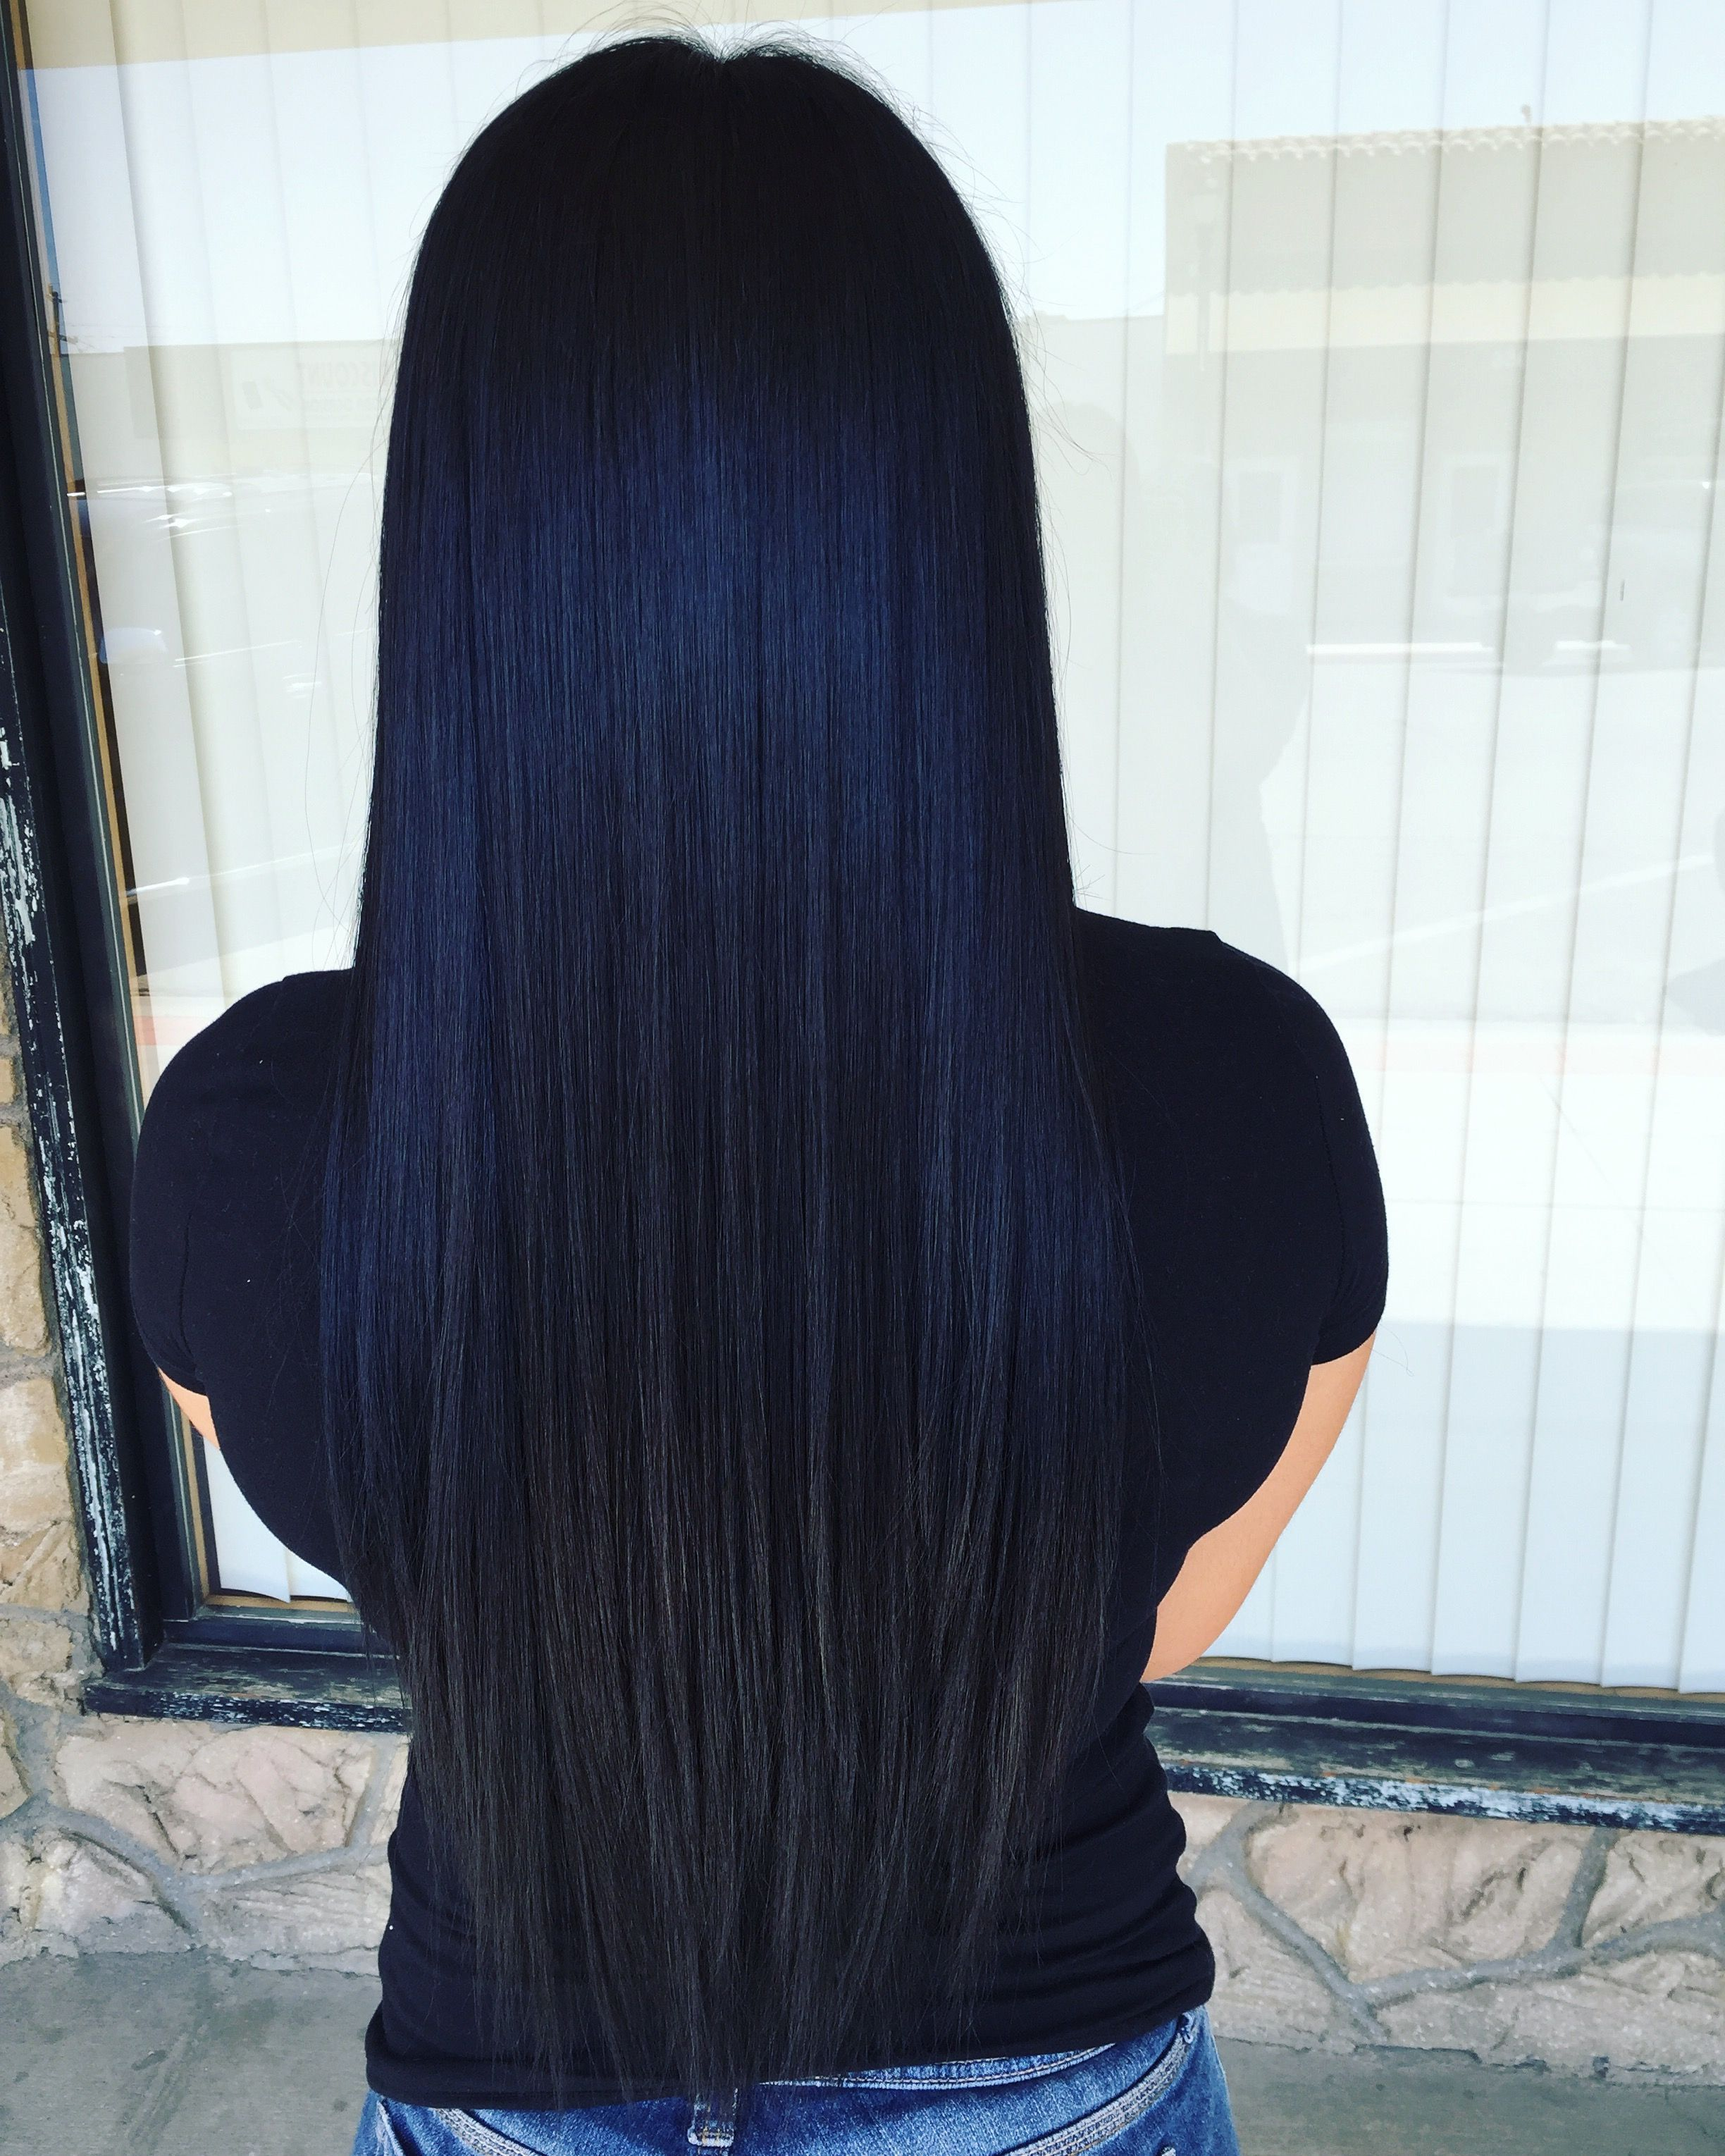 Schone Schwarze Und Blaue Frisuren Neu Frisuren 2018 Hair Color Blue Gorgeous Hair Color Hair Styles